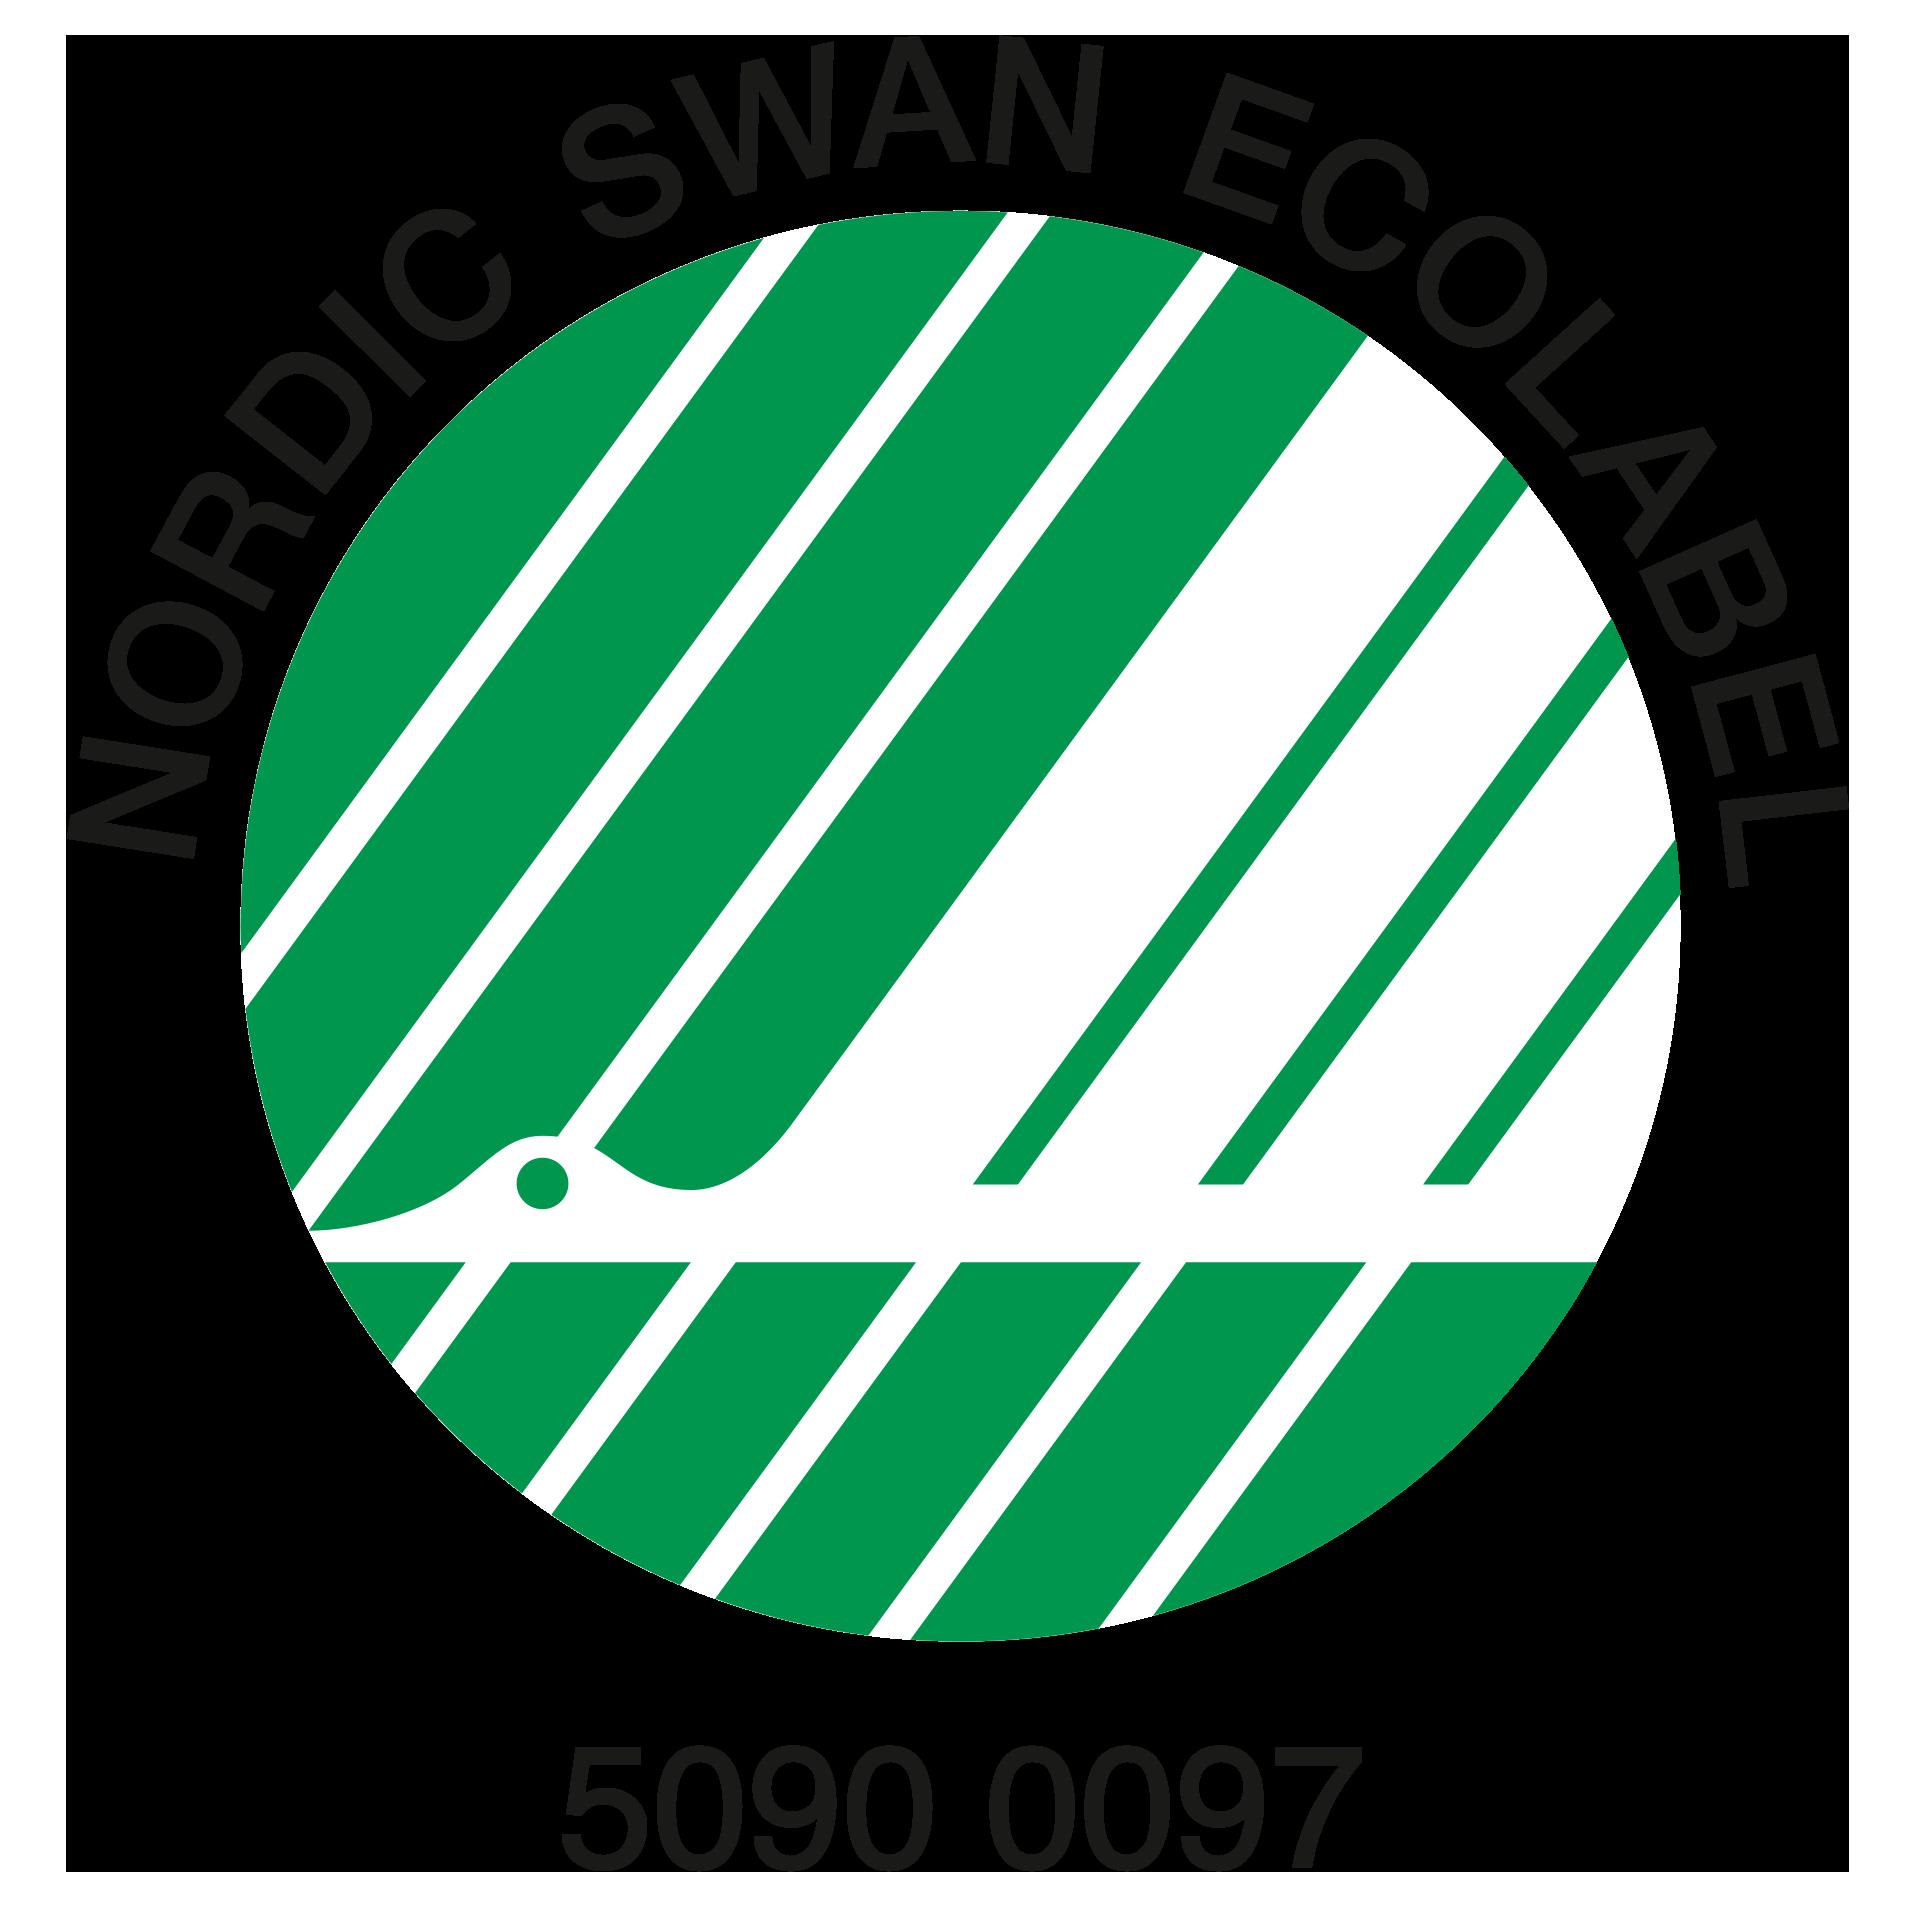 Nordic Ecolabel 5090-0097